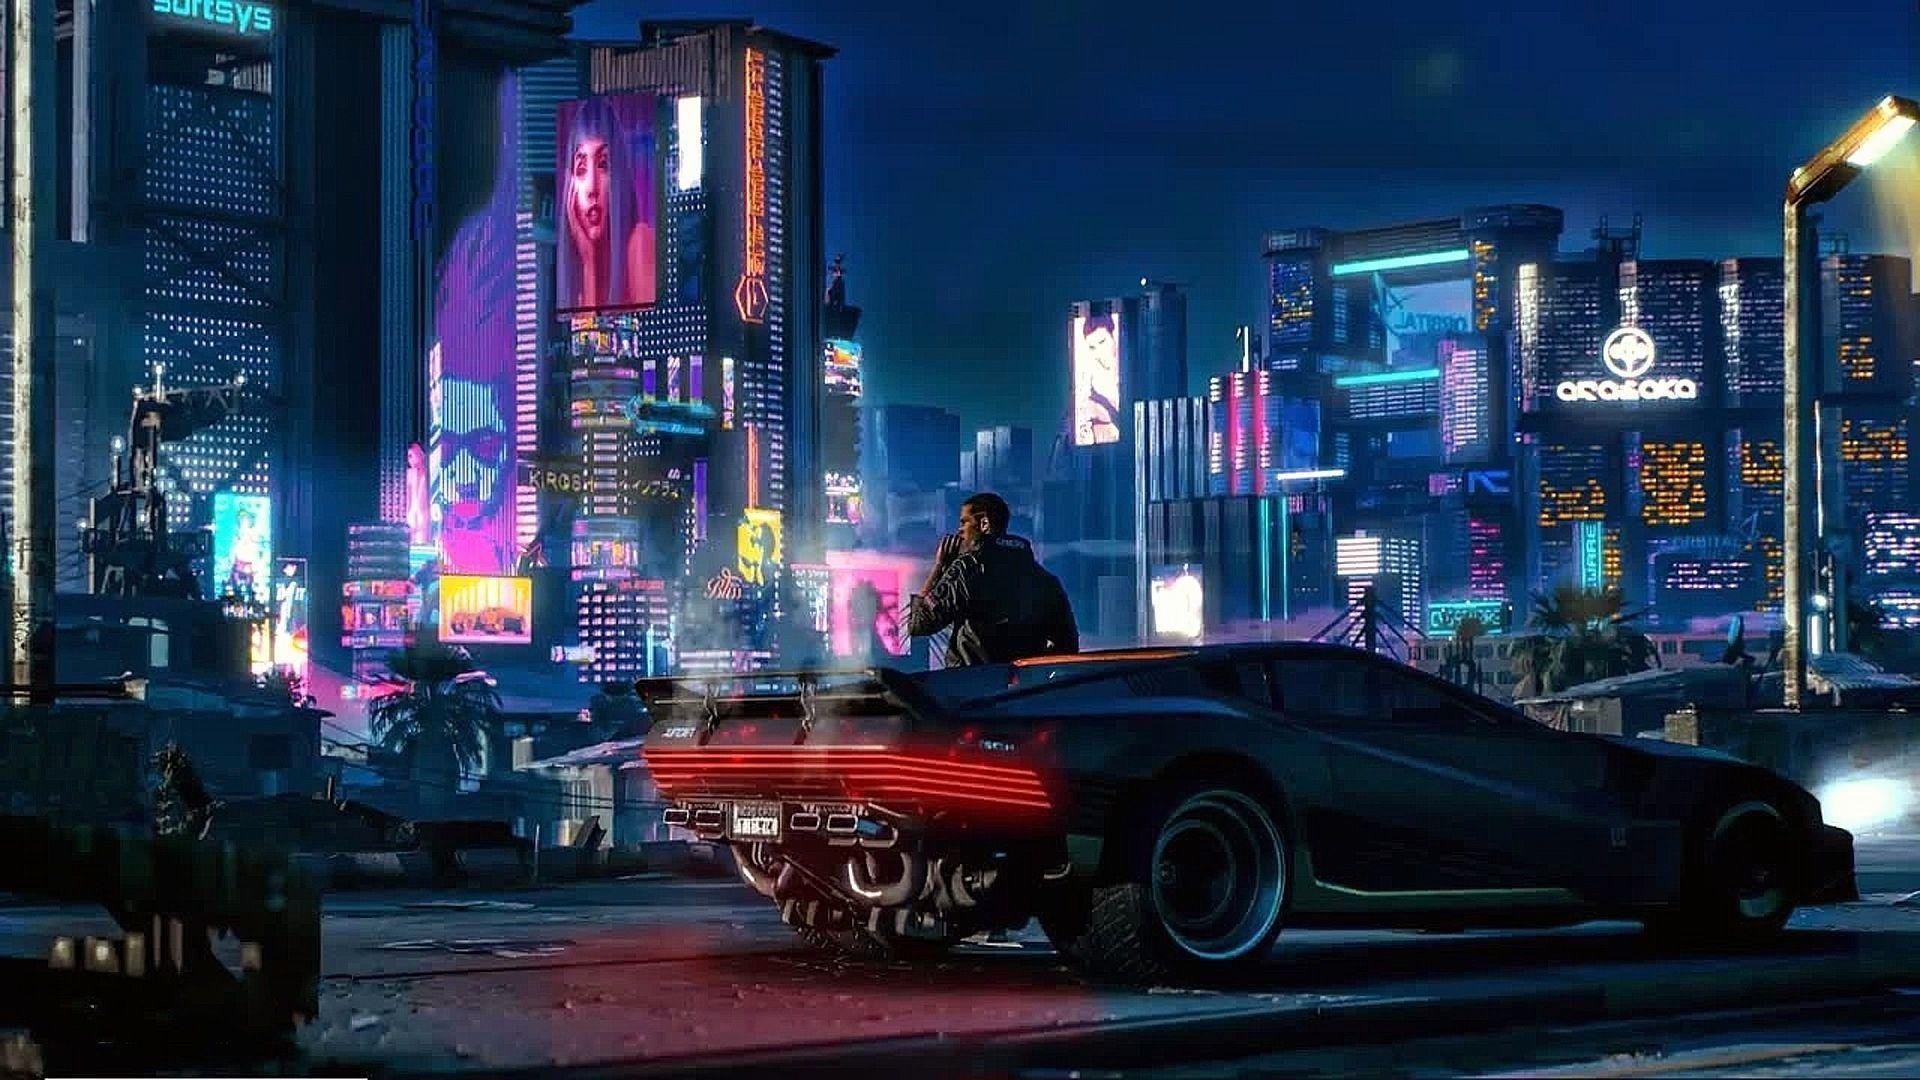 Cyberpunk 2077 Hd Wallpapers Top Free Cyberpunk 2077 Hd Backgrounds Wallpaperaccess